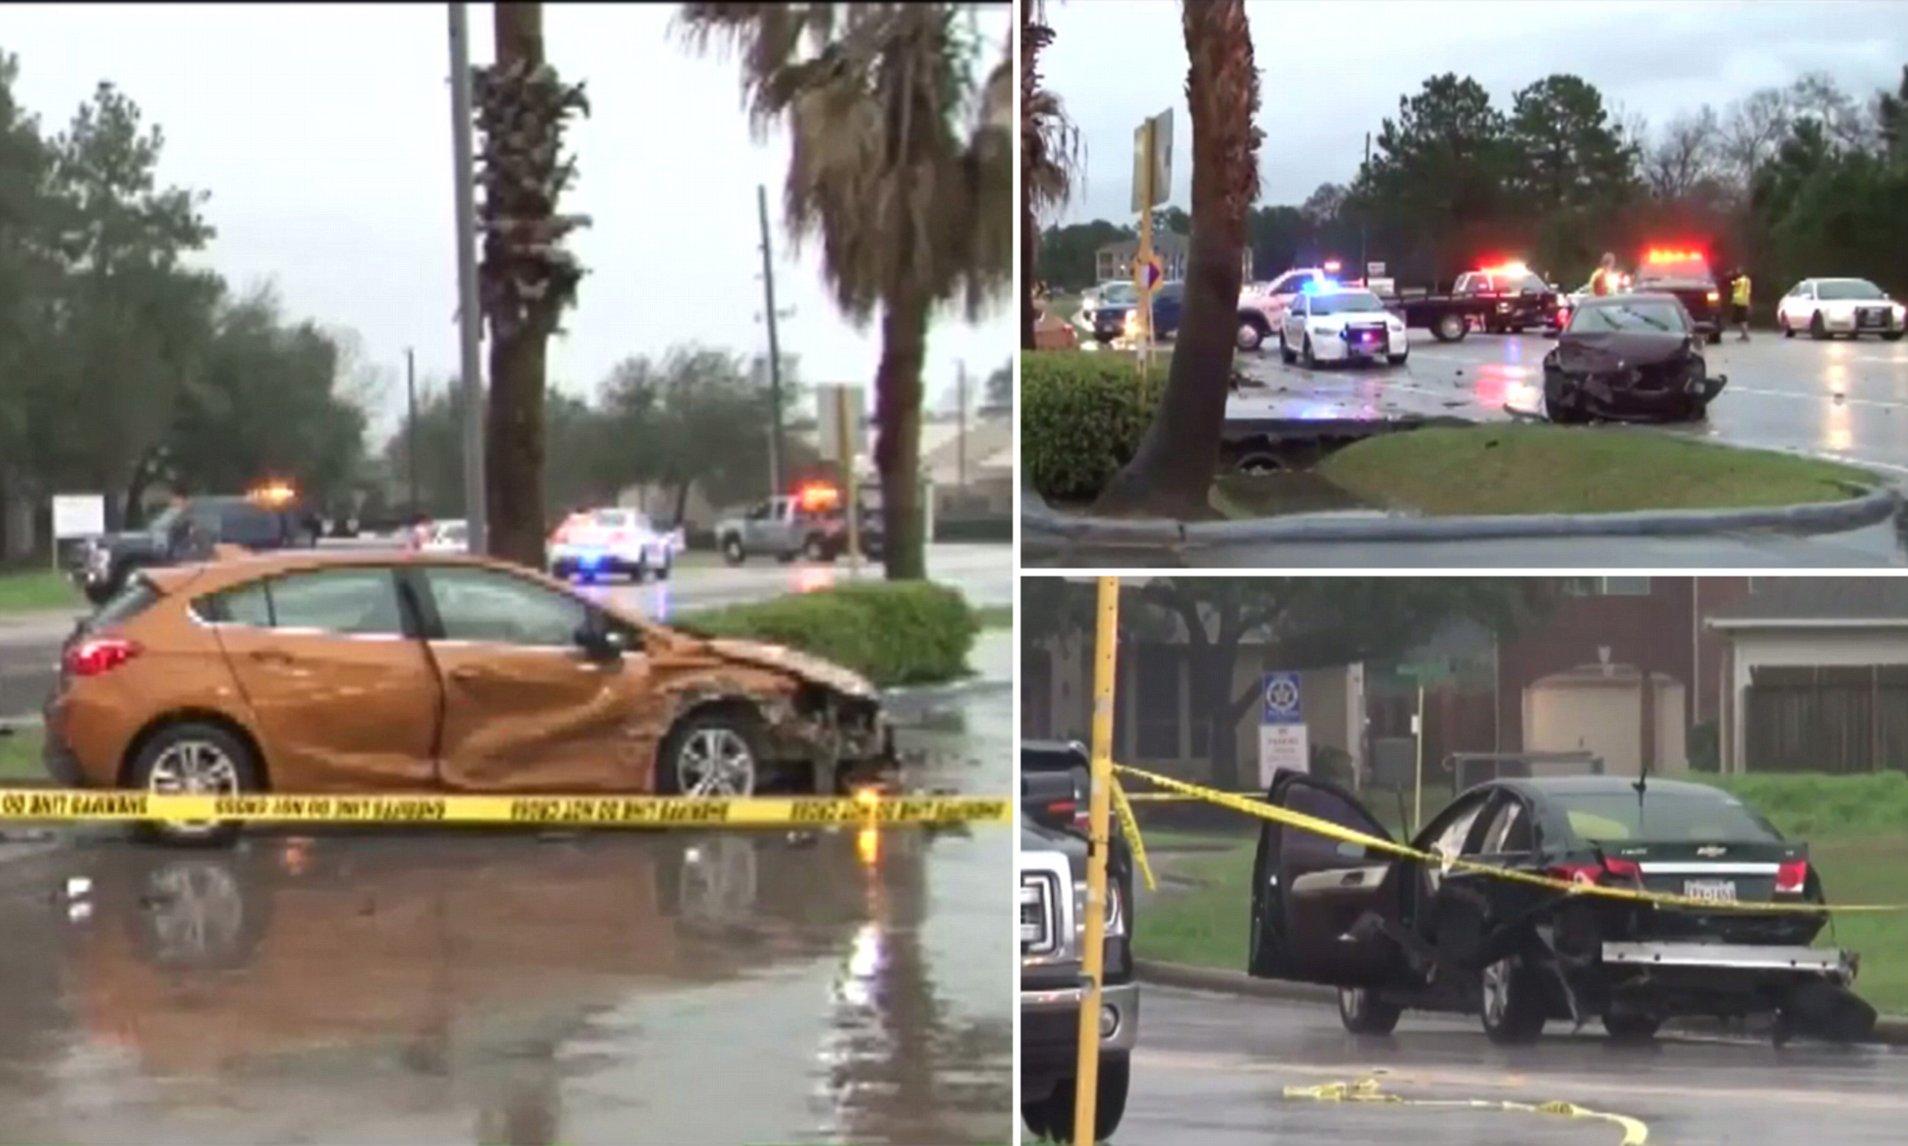 acidente Texas suicídio homem